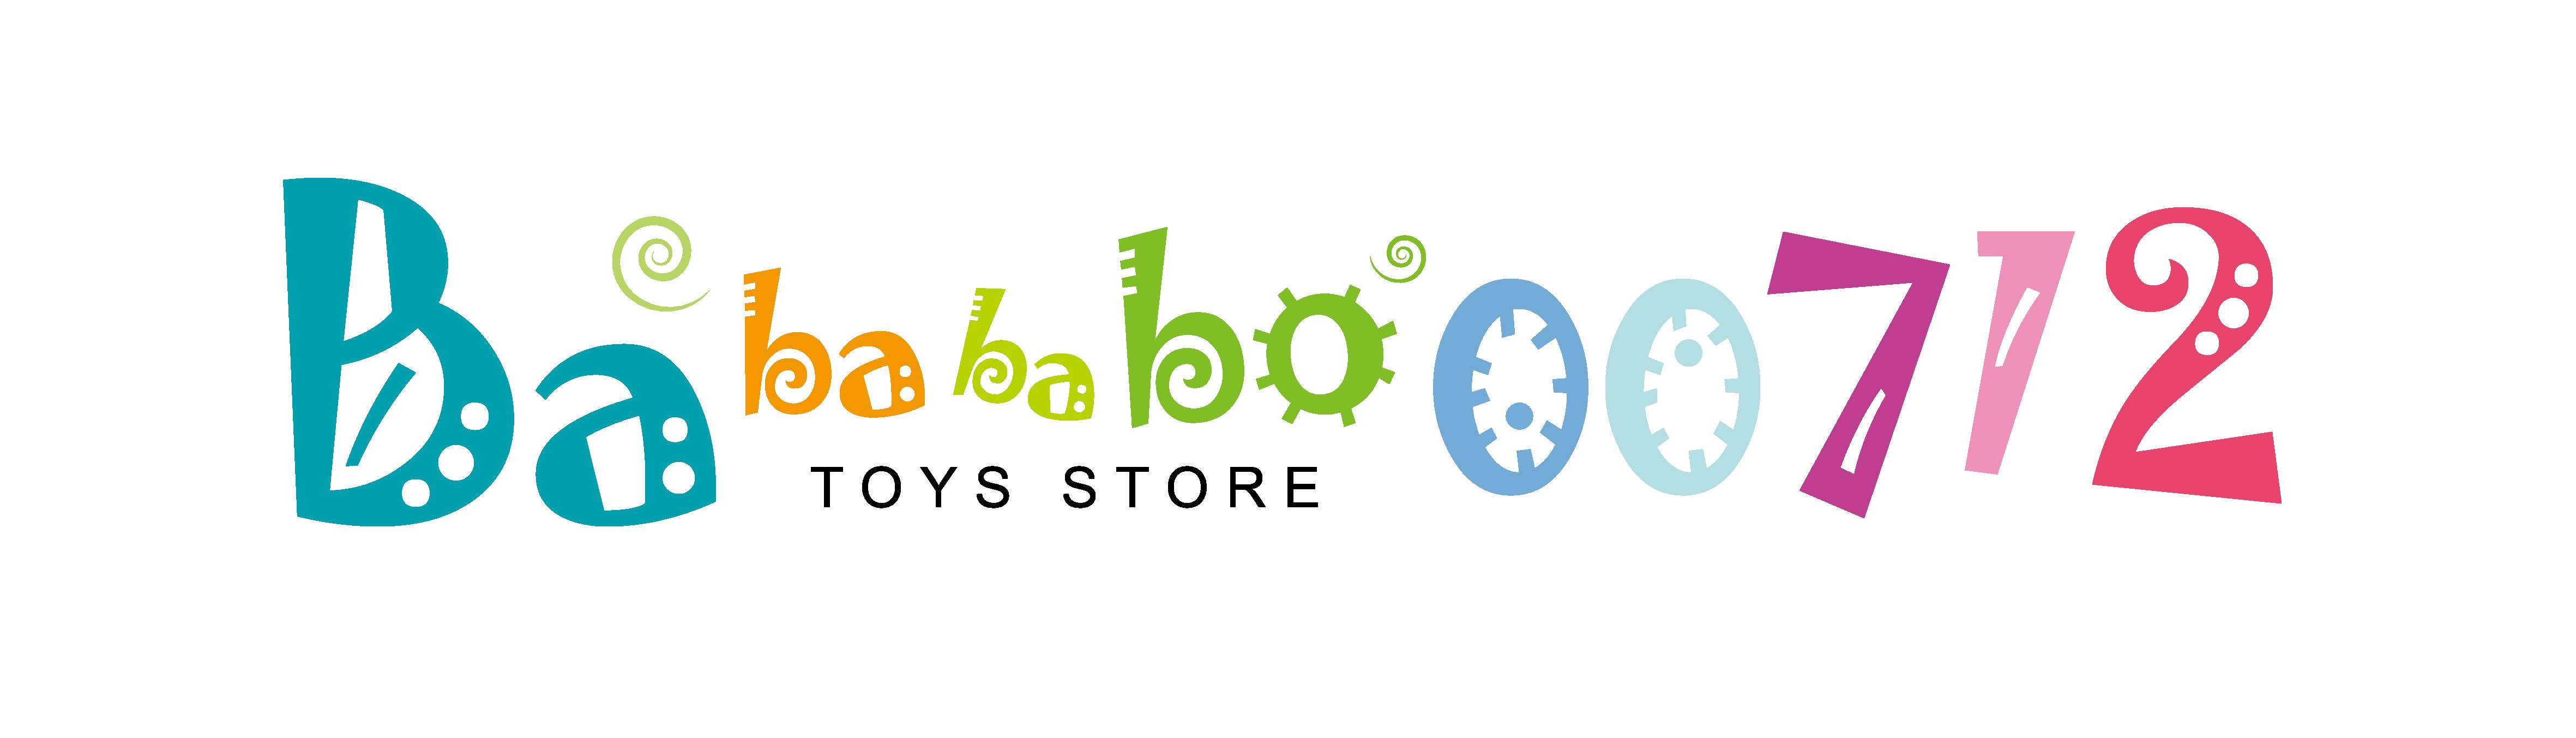 bababobo00712 Toys store